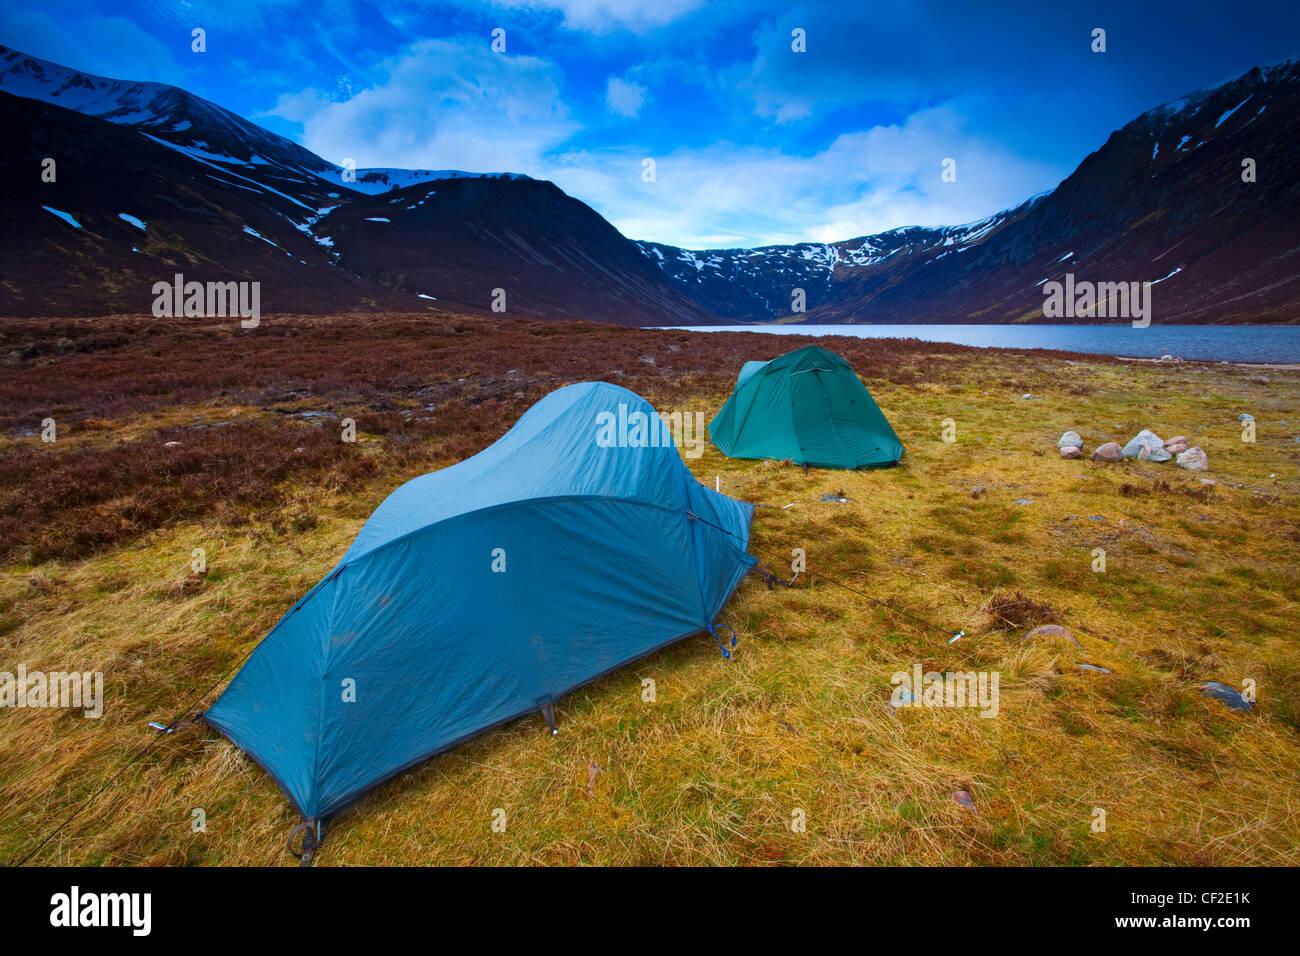 Wild camping stockfotos wild camping bilder alamy for Wildparks in der nahe